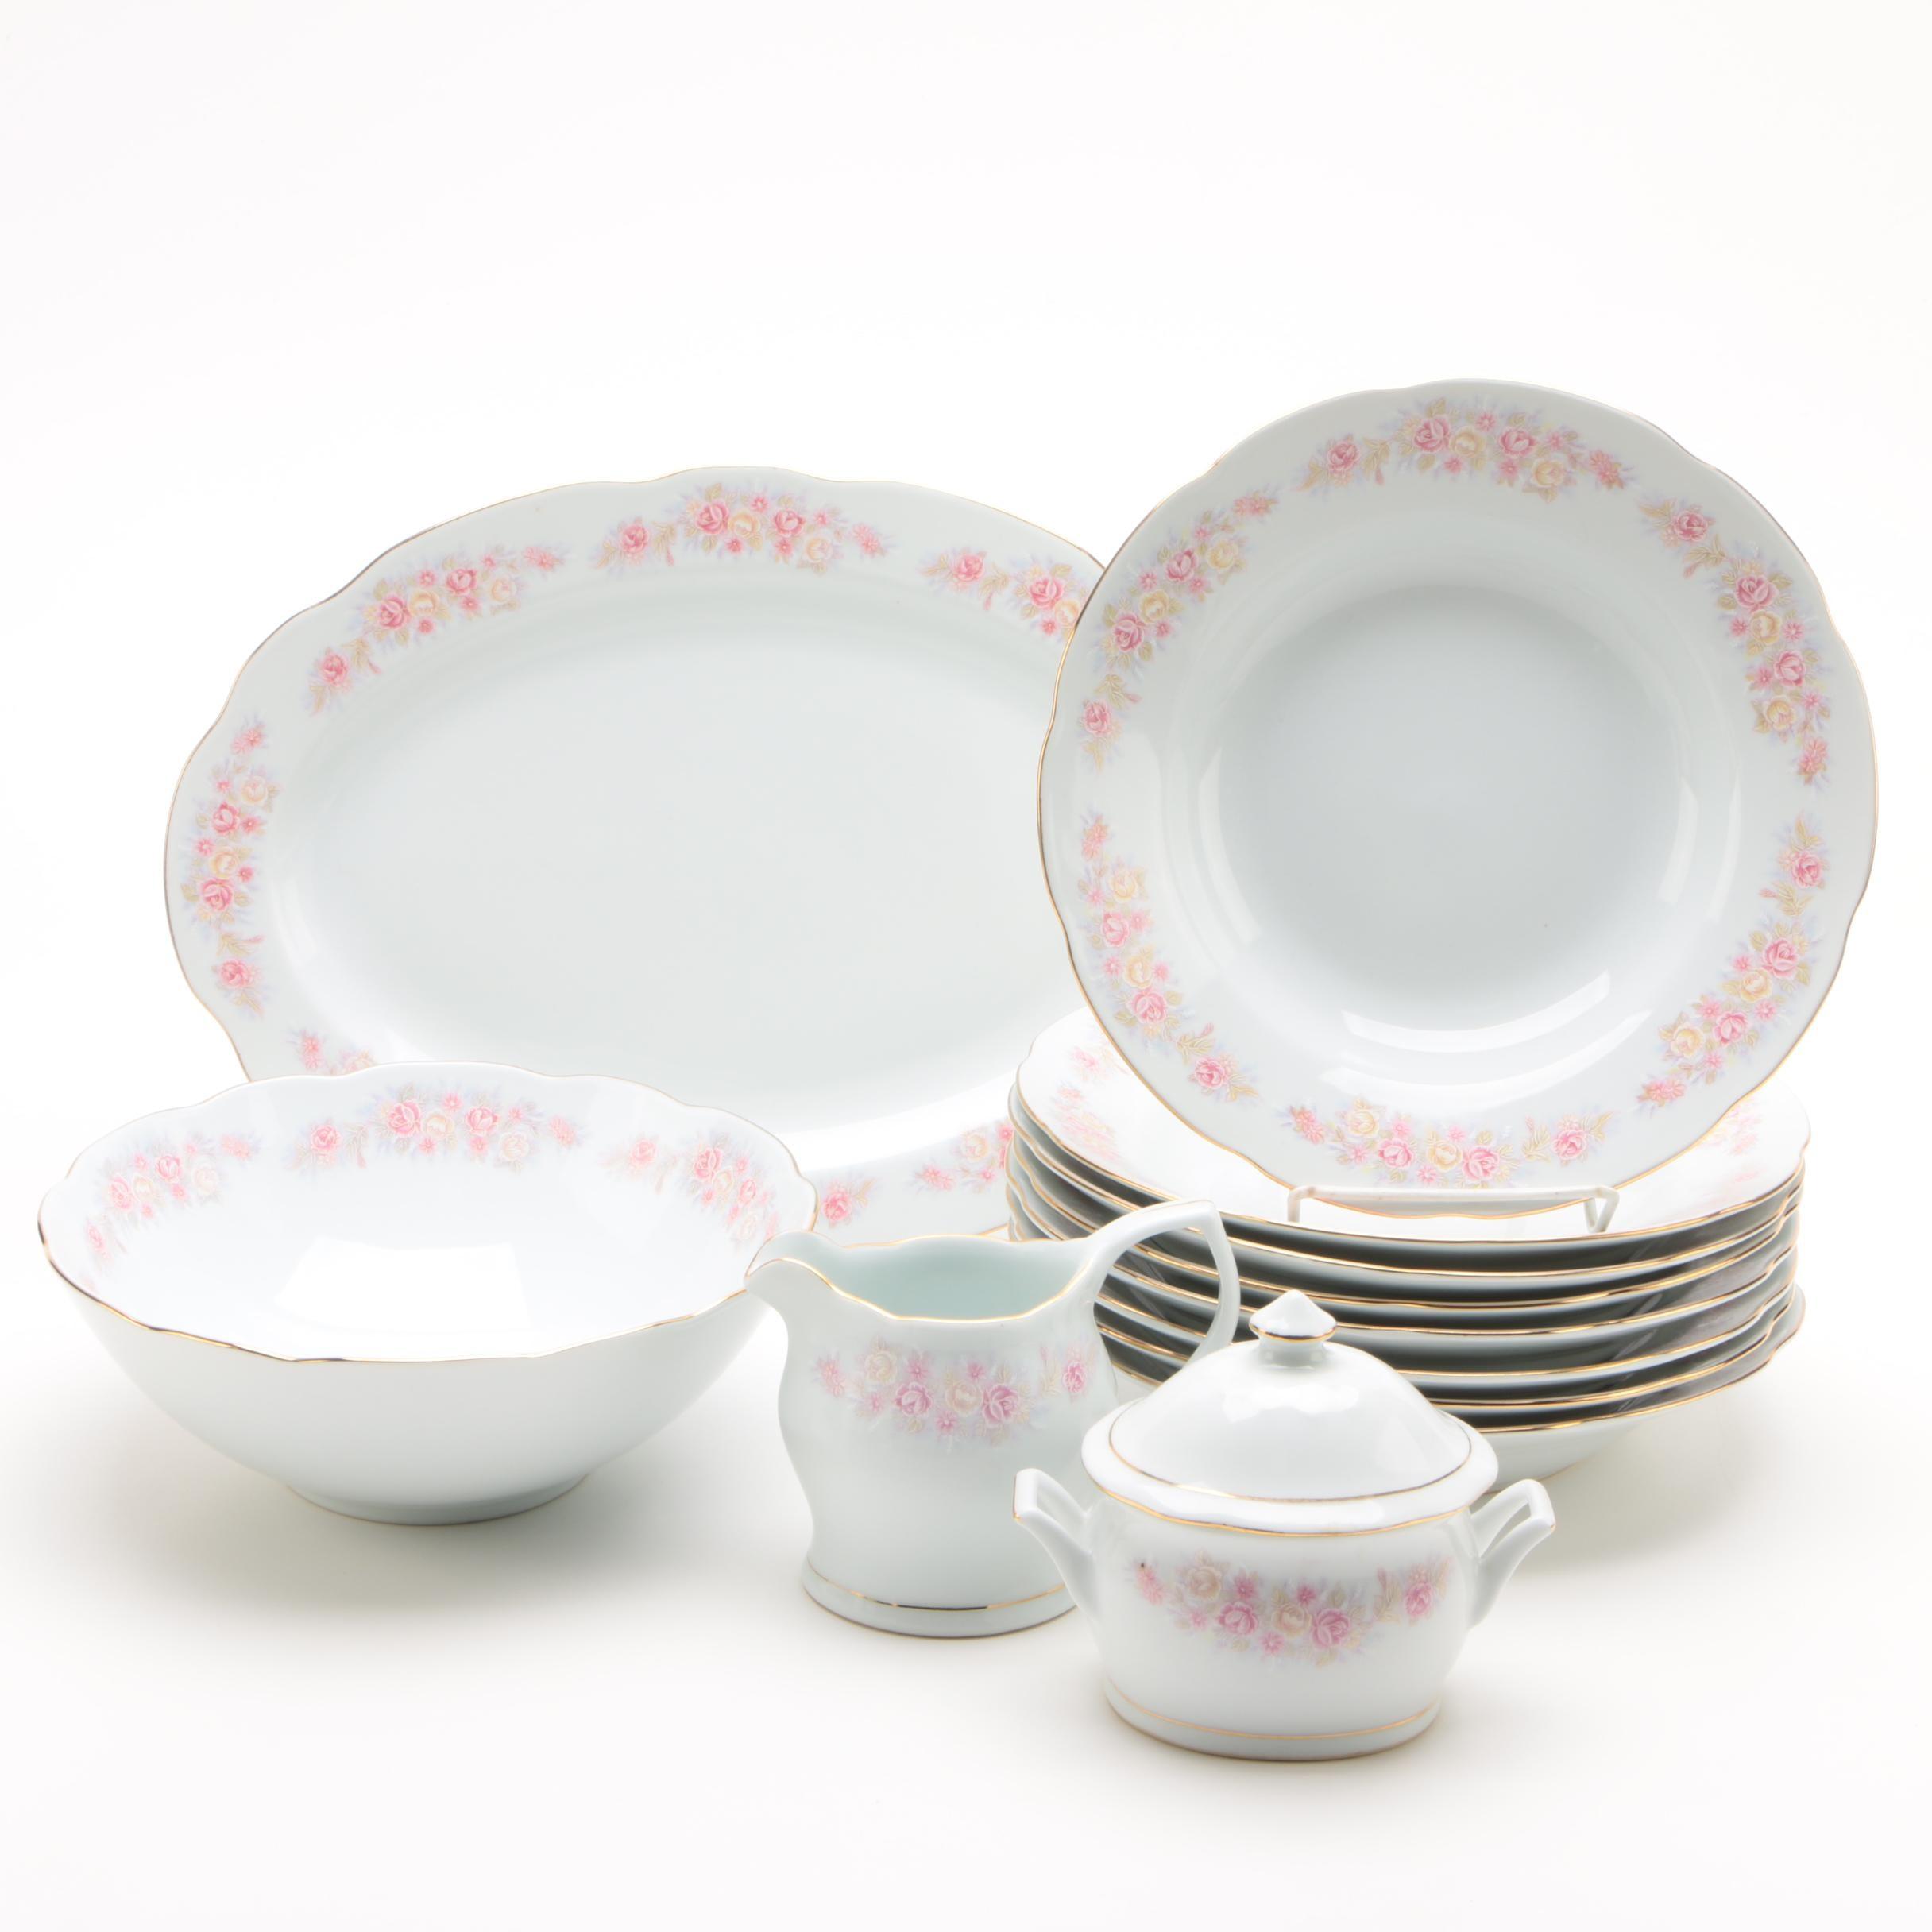 Vintage Chinese Floral Porcelain Dinnerware Set